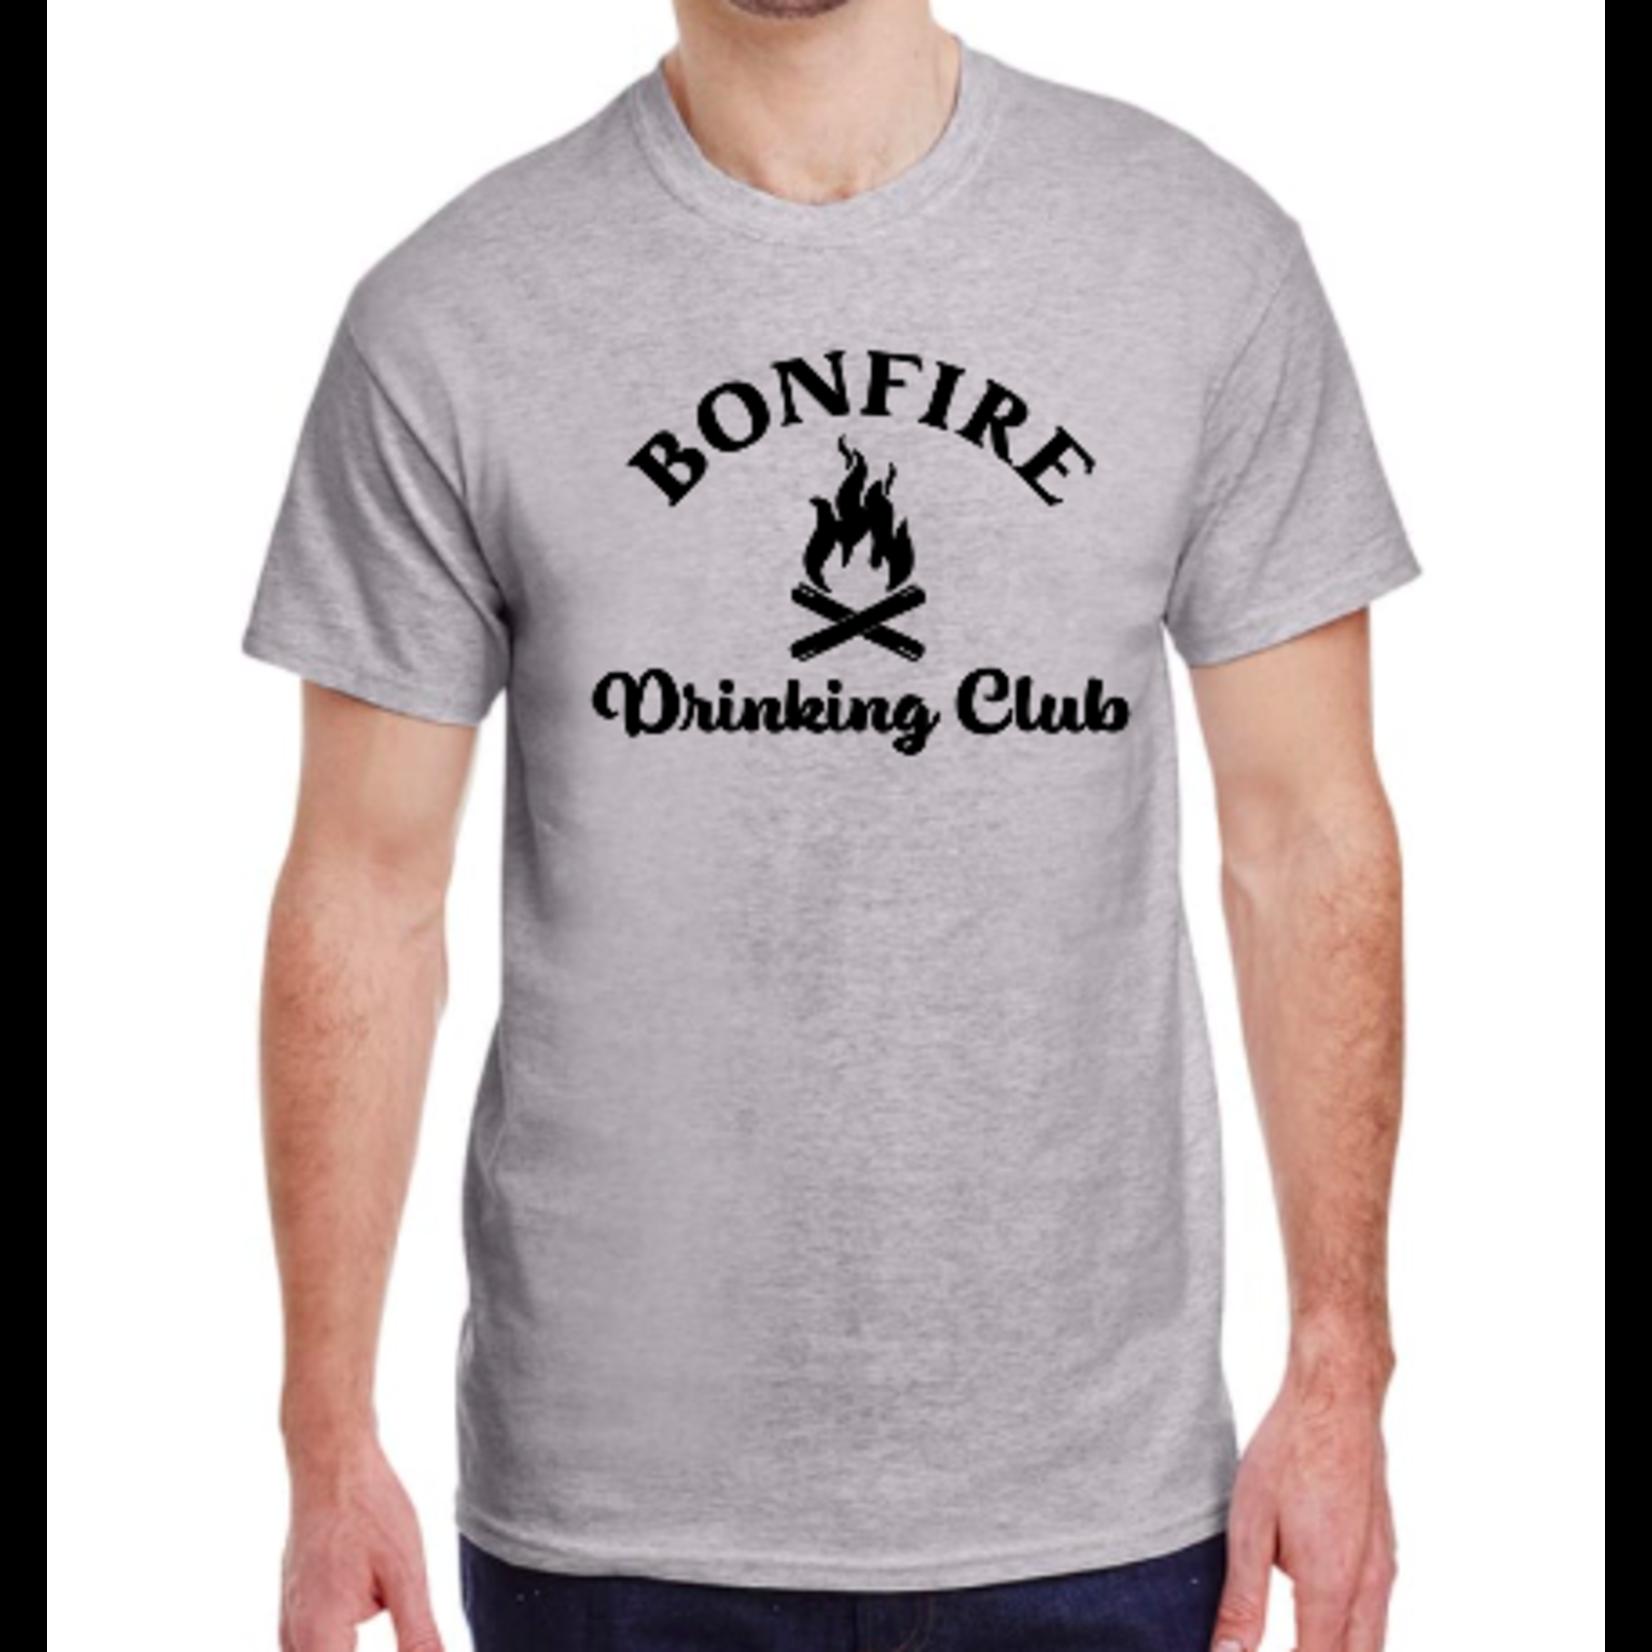 favourite things apparel Bonfire drinking club